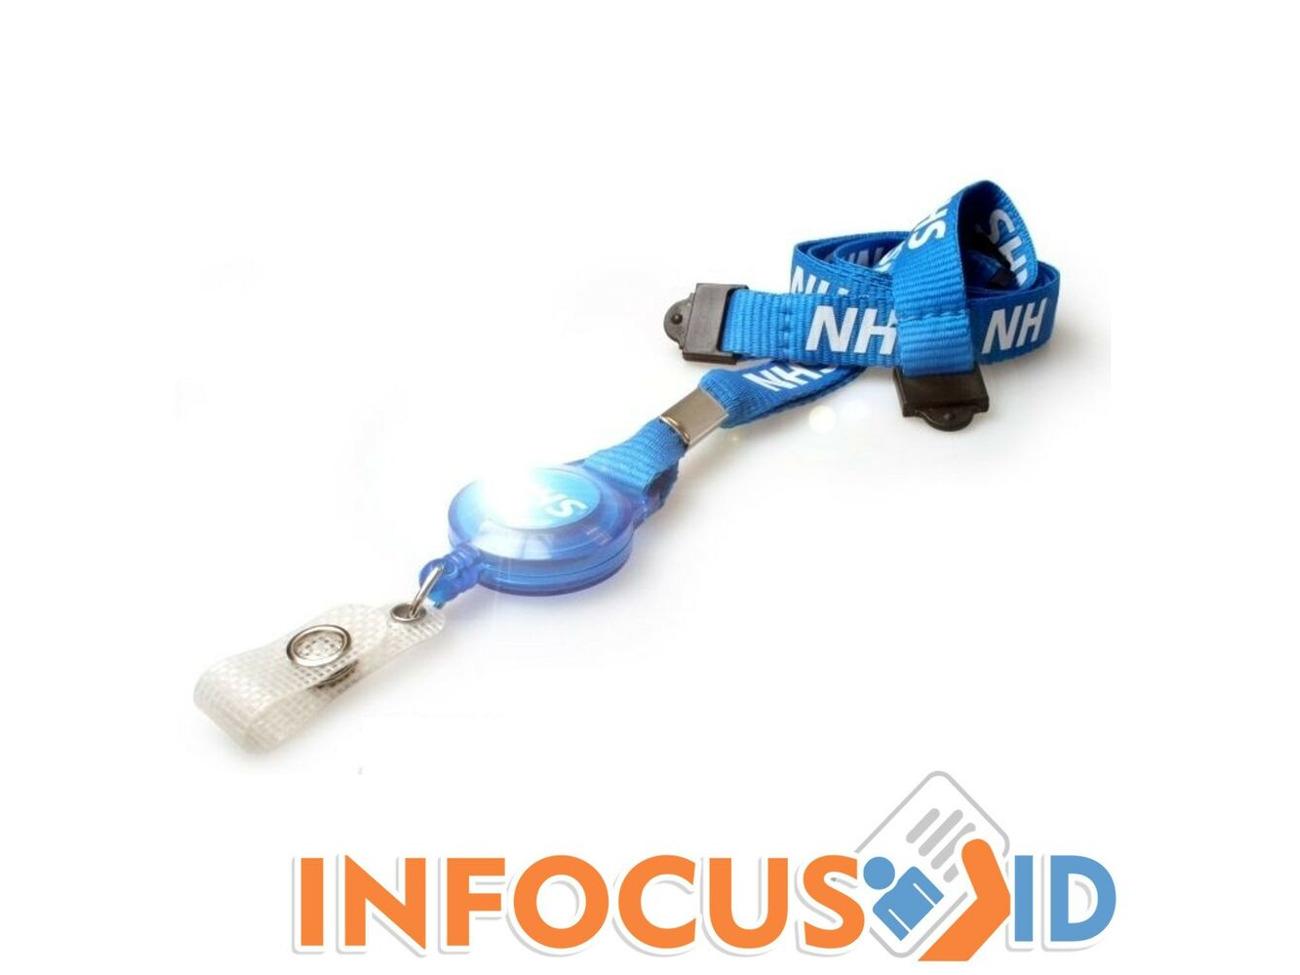 NHS Metal Lobster Clip Double Breakaway Lanyard with Clear Vinyl ID Badge Holder